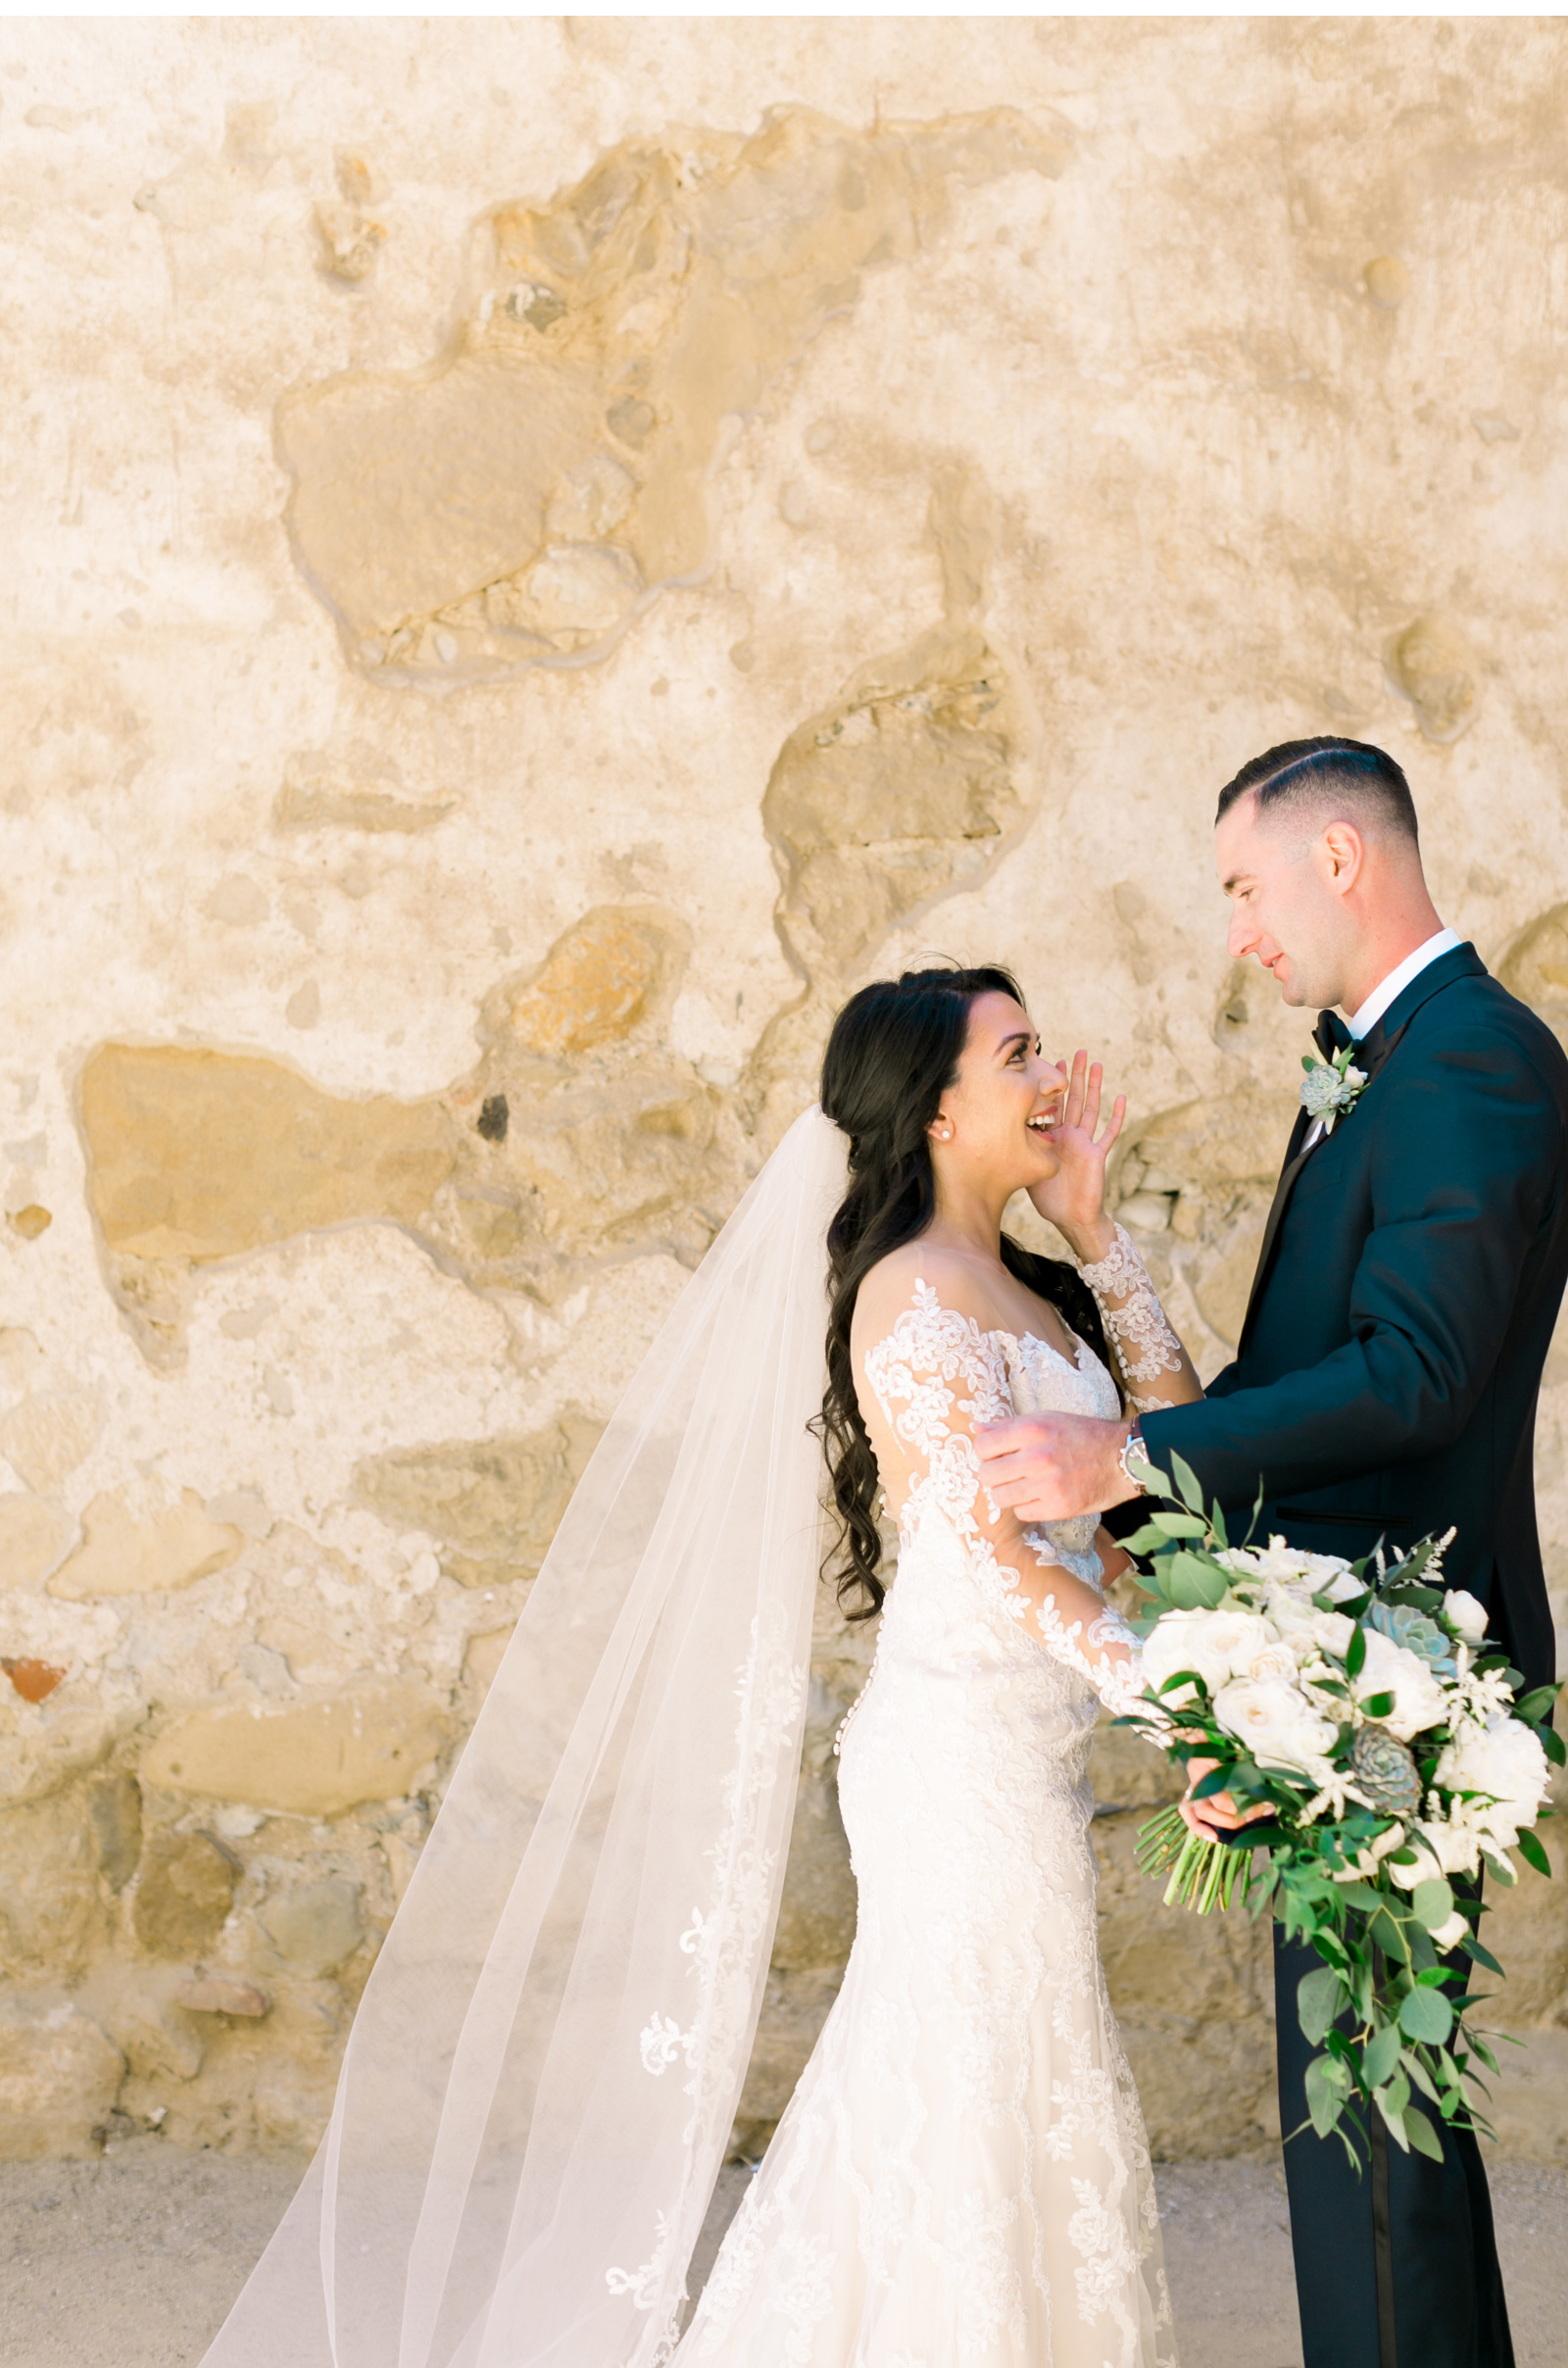 Southern-California-Weddings-Natalie-Schutt-Photography-Weddings_01.jpg